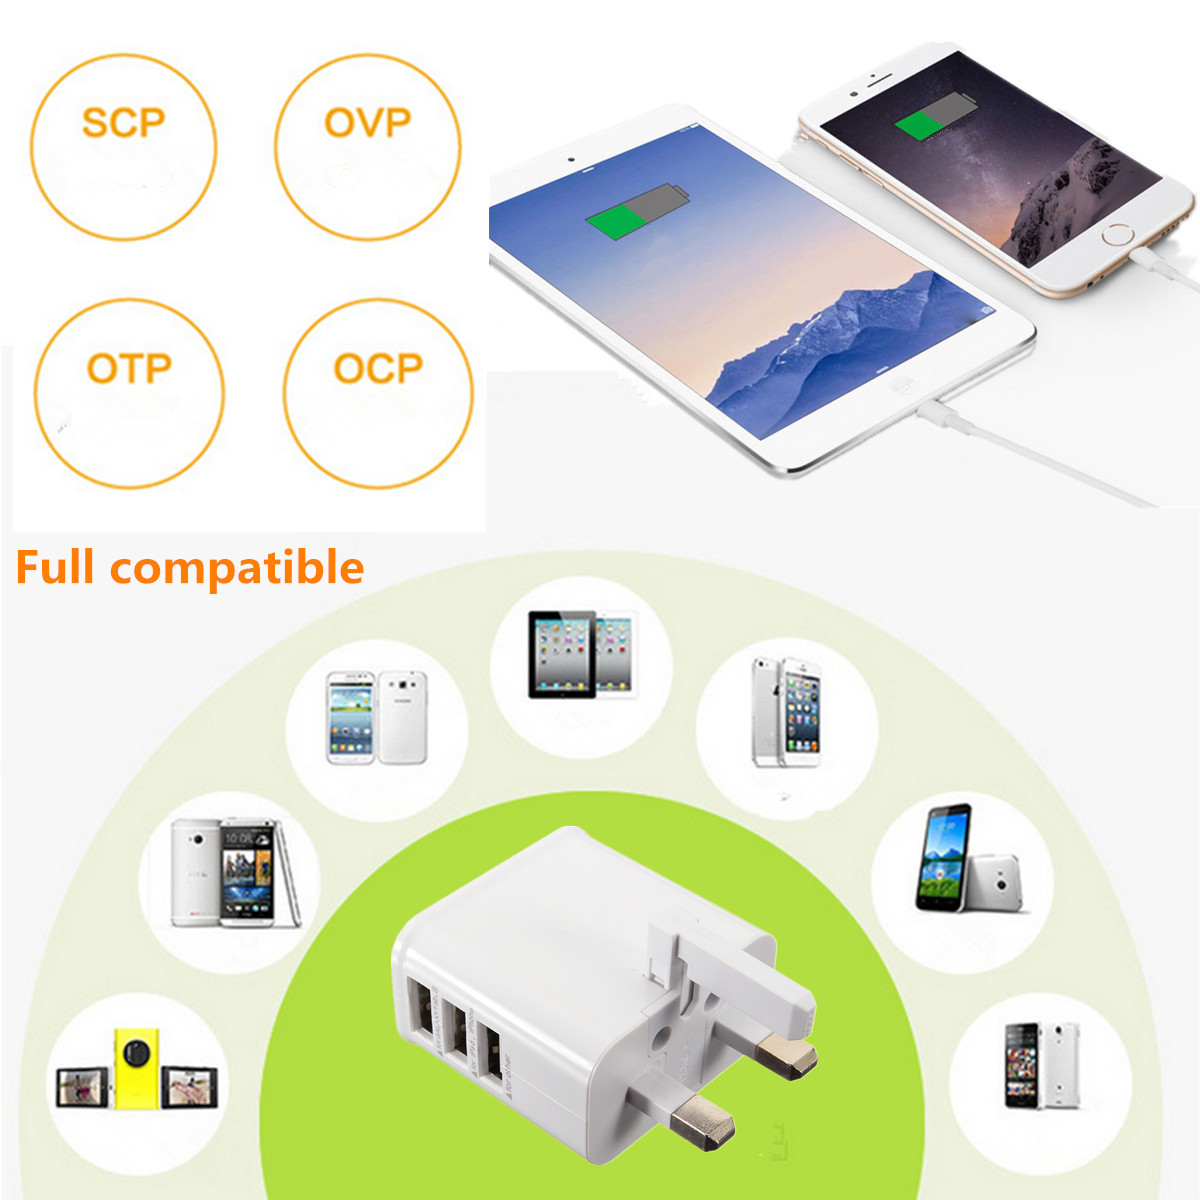 Universal Uk Plug 3 Usb Port 5v 3a Travel Wall Charger Adapter For Casan 3usb Samsung Lg